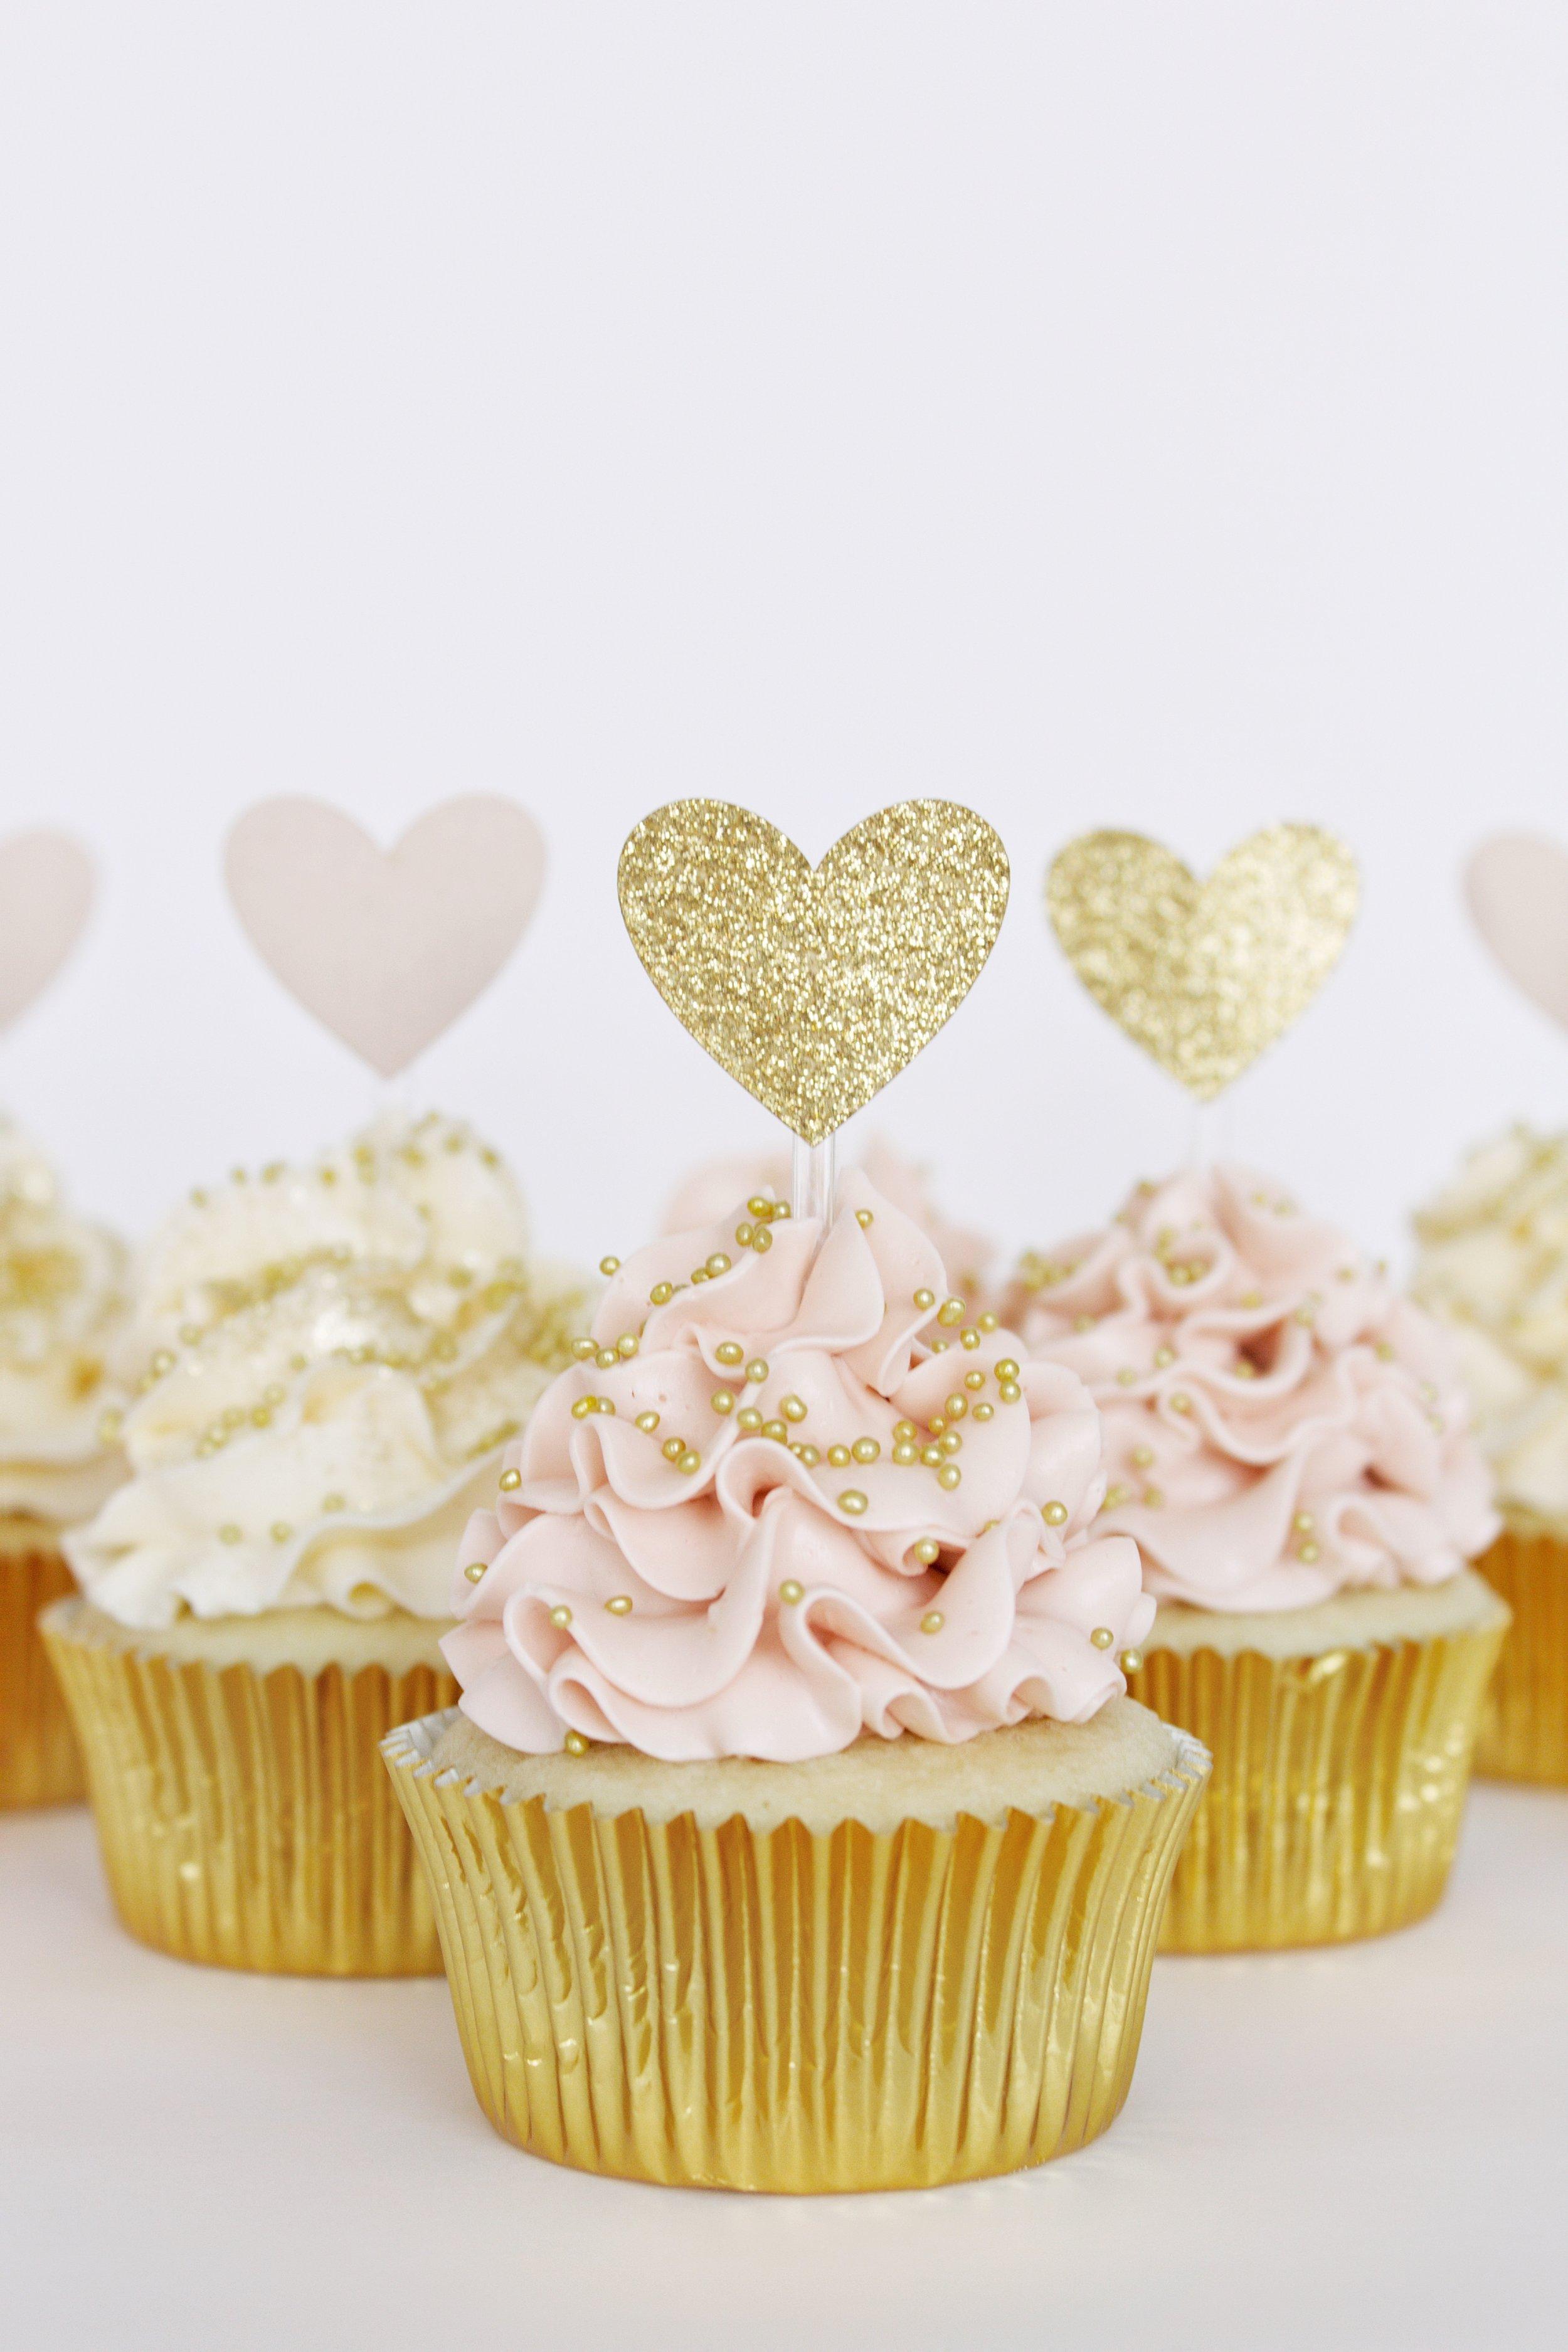 Standard Cupcake